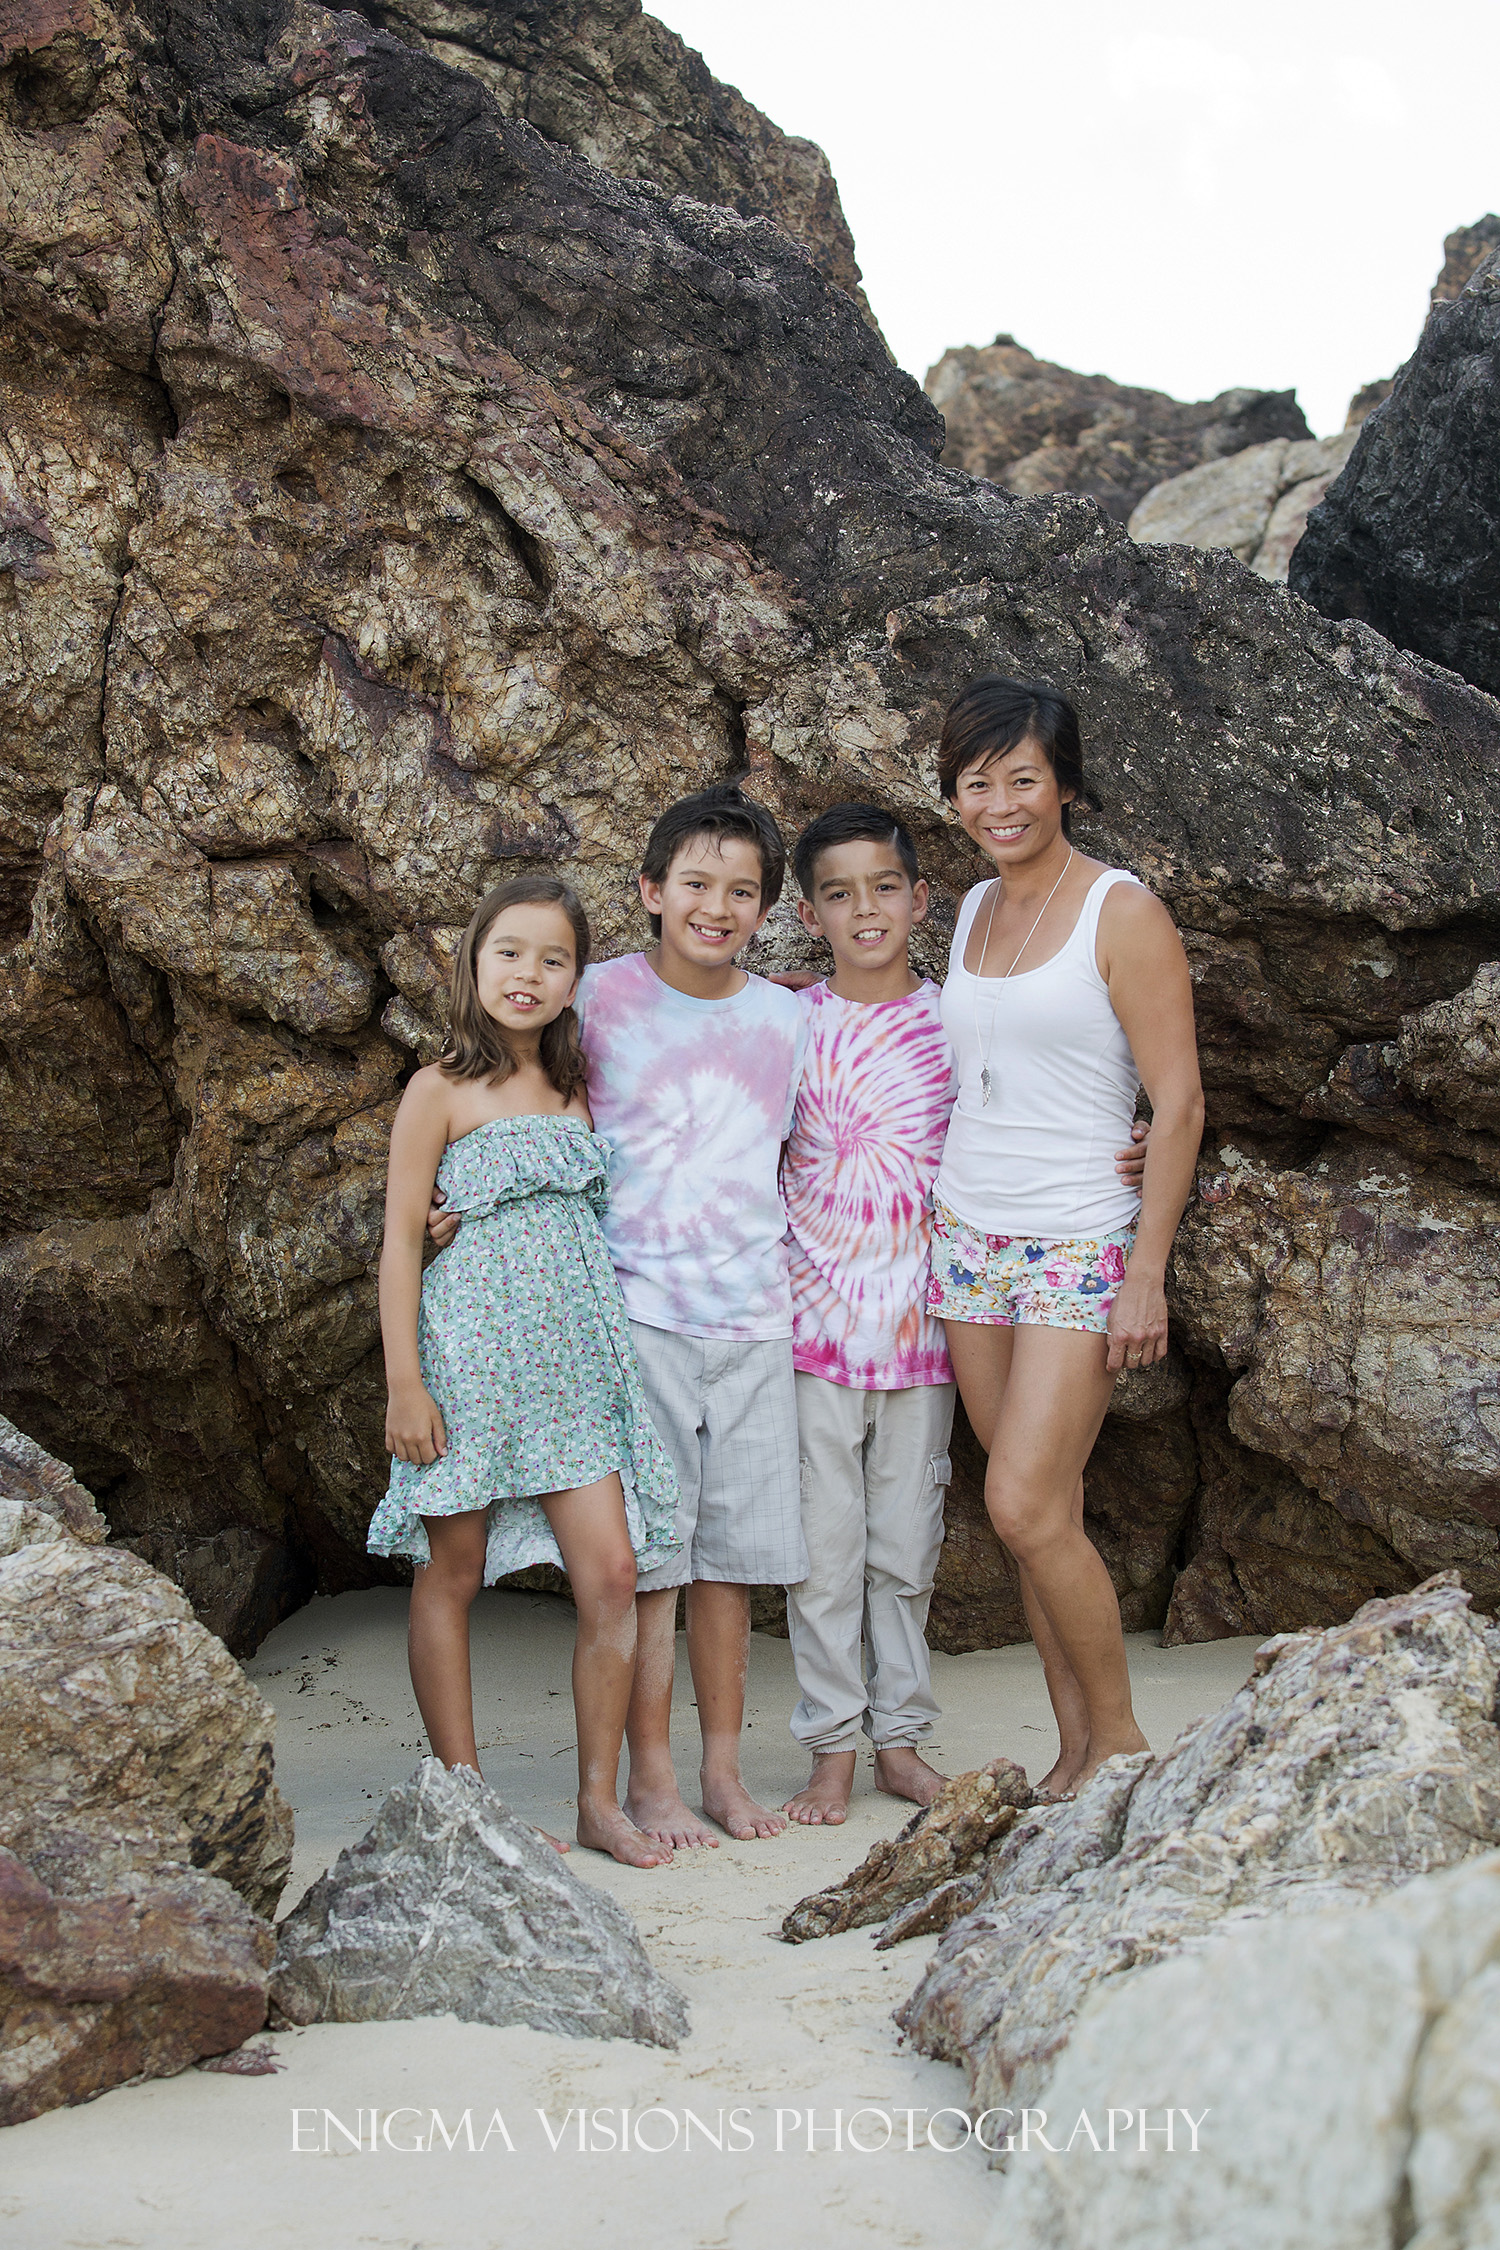 EnigmaVisionsPhotography_FAMILY_Sarah (4).jpg